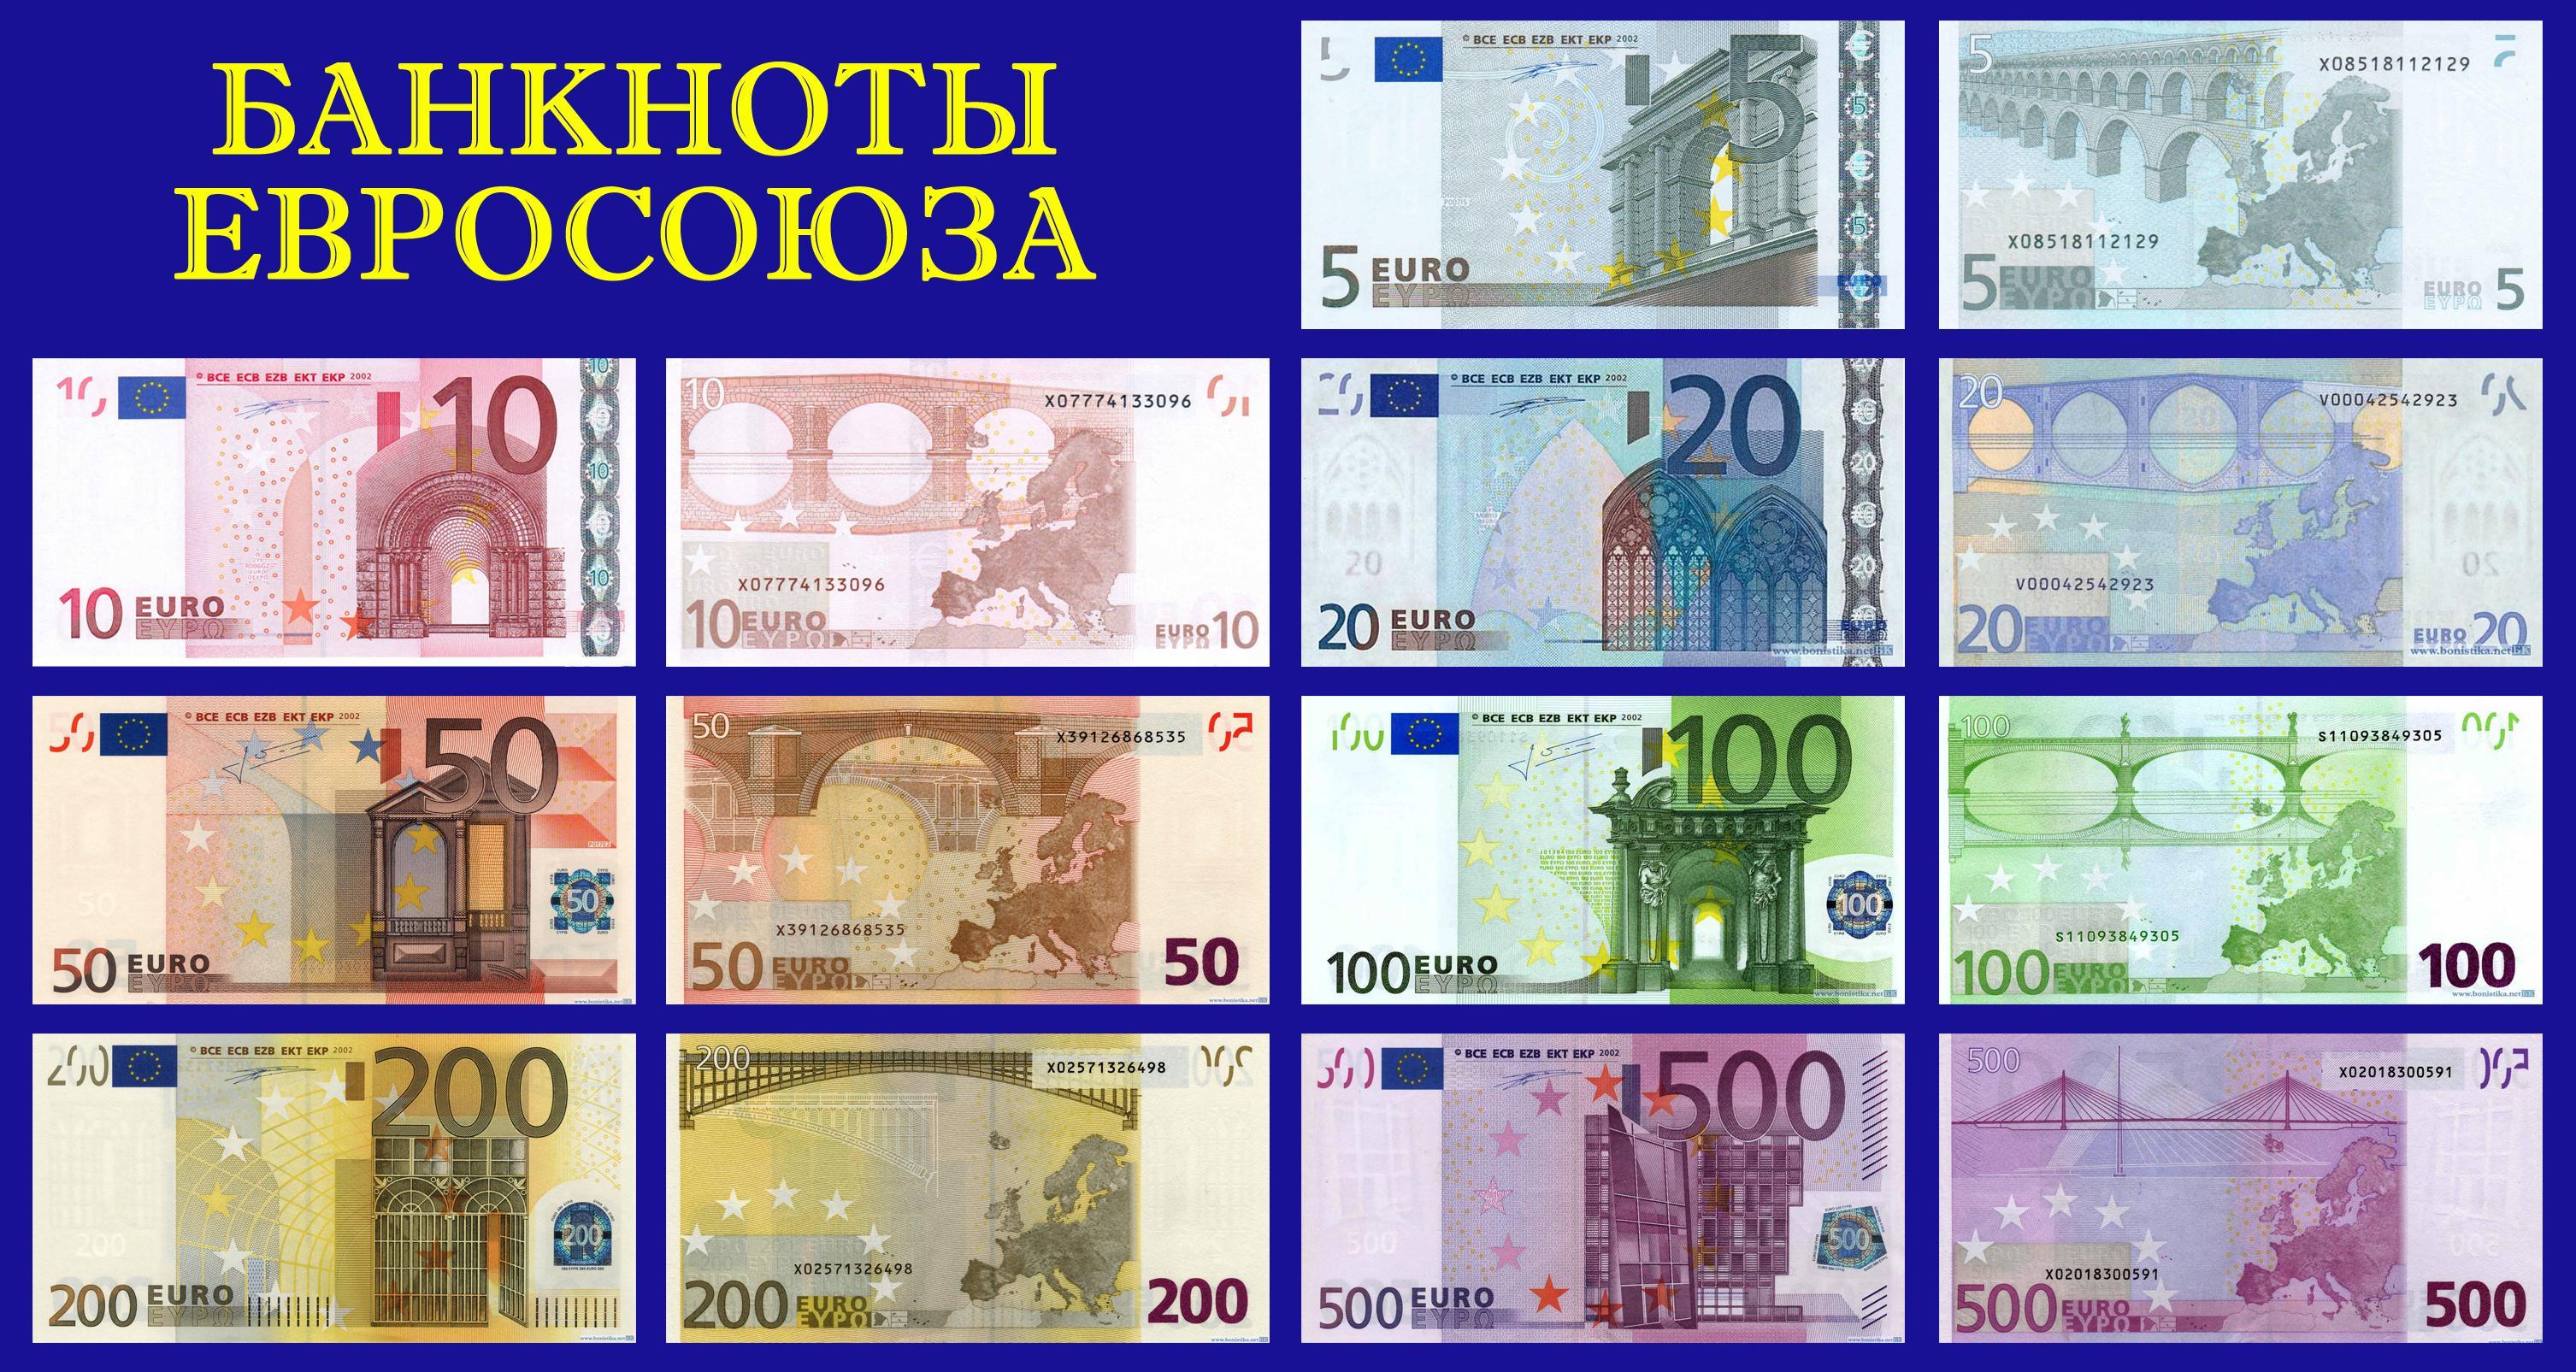 Вид европейского евро, банкноты